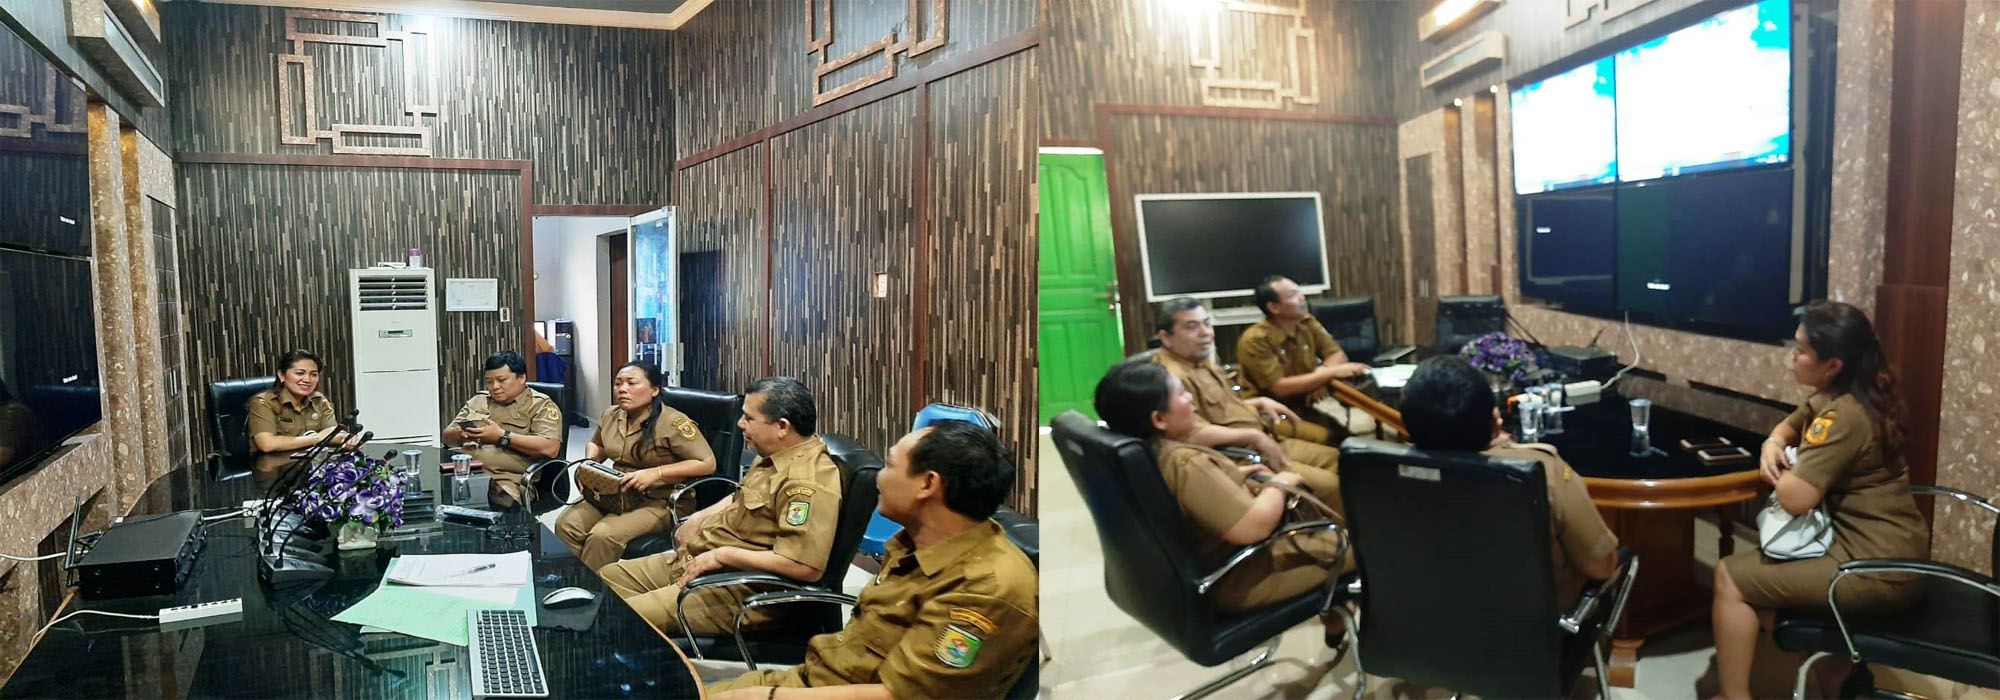 Kunjungan Kerja Dinas Kominfo Kabupaten Dairi